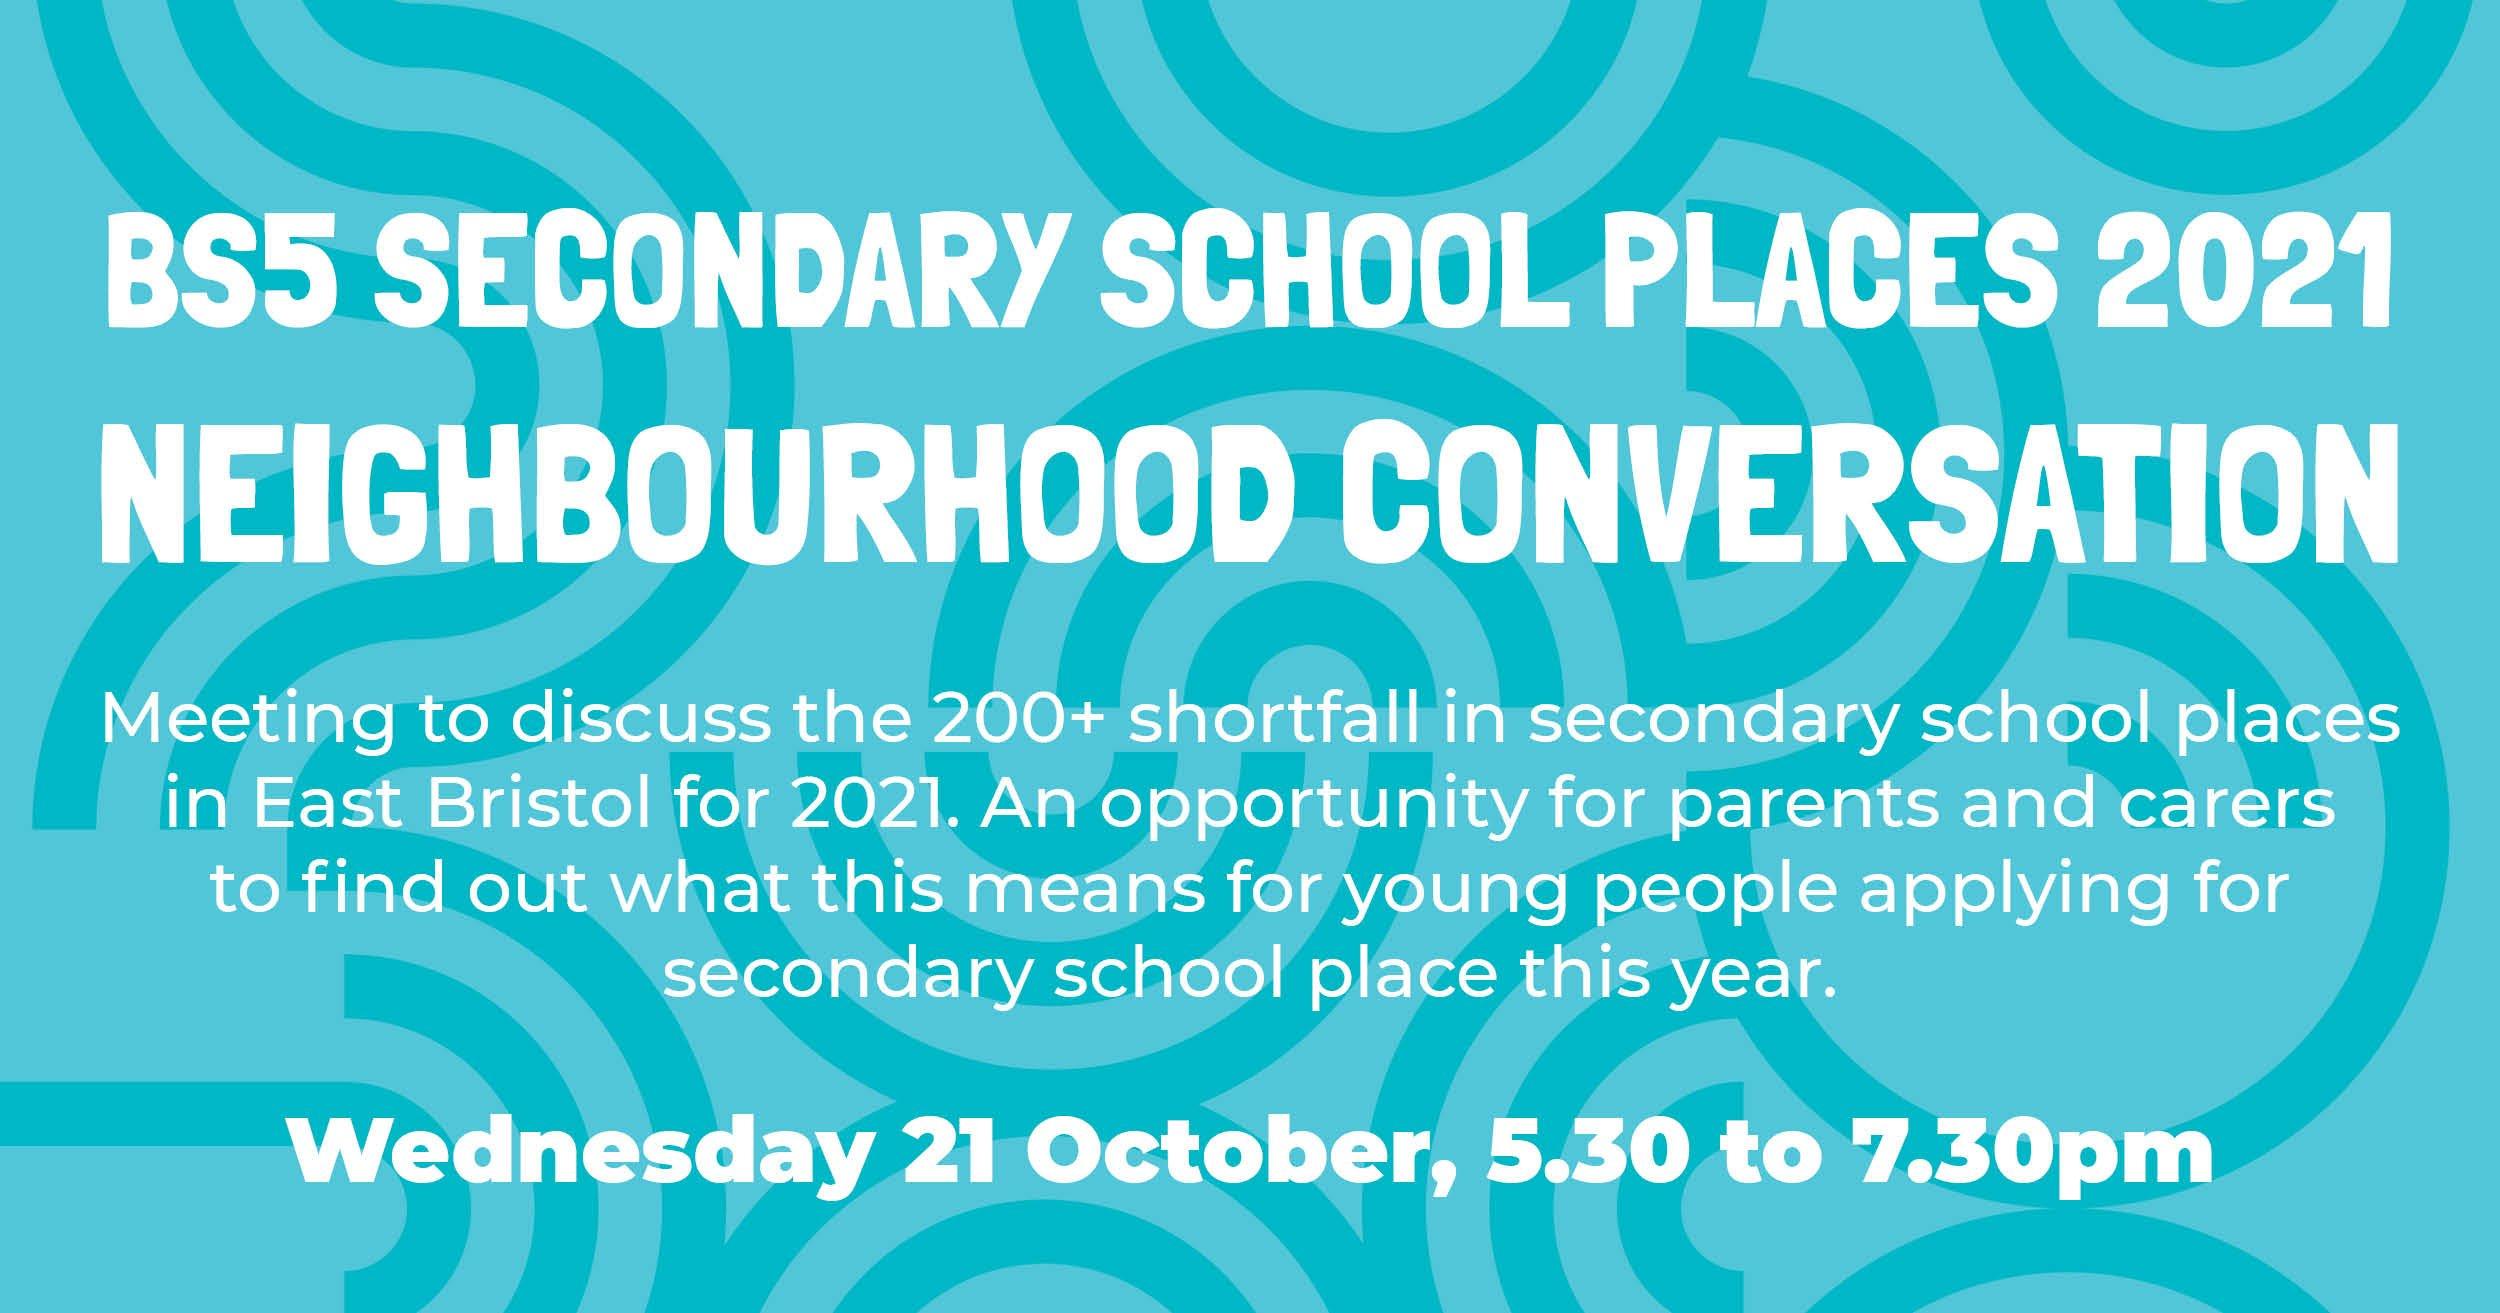 Neighbourhood convo Oct 2020